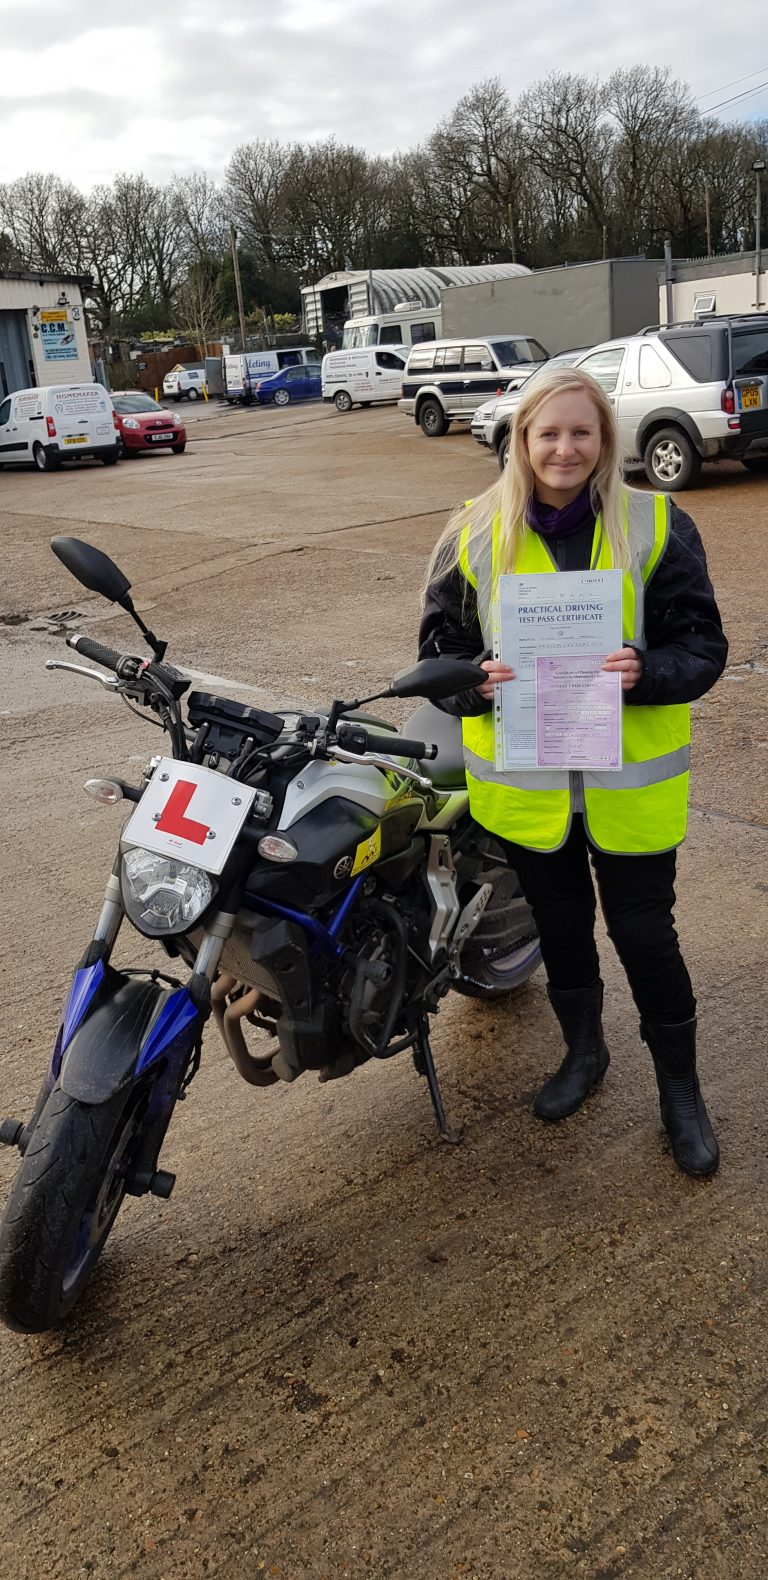 Lady biker passes DAS!